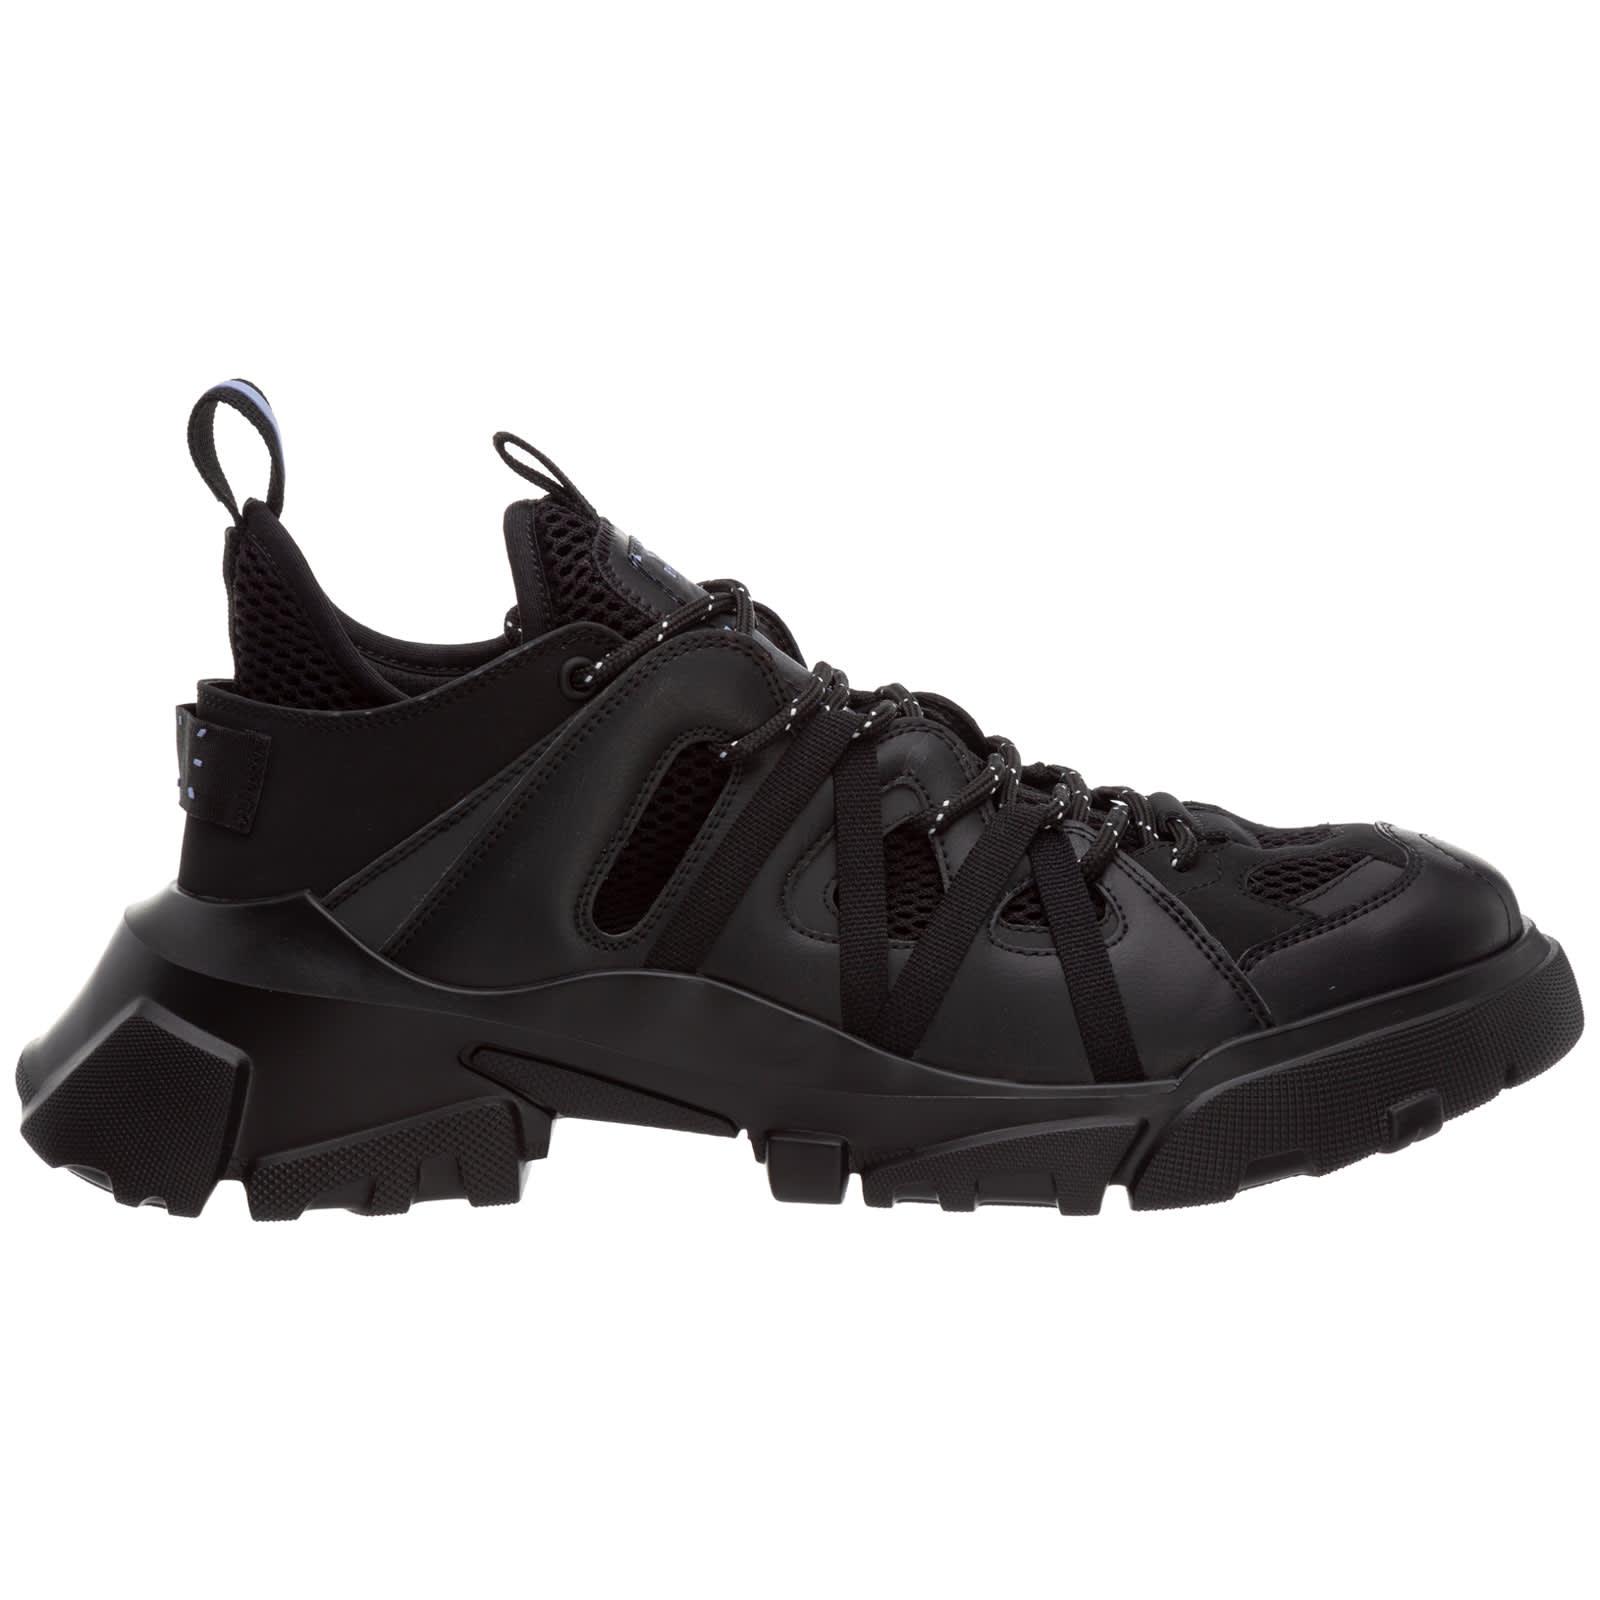 Mcq Orbyt Descender 2.0 Sneakers